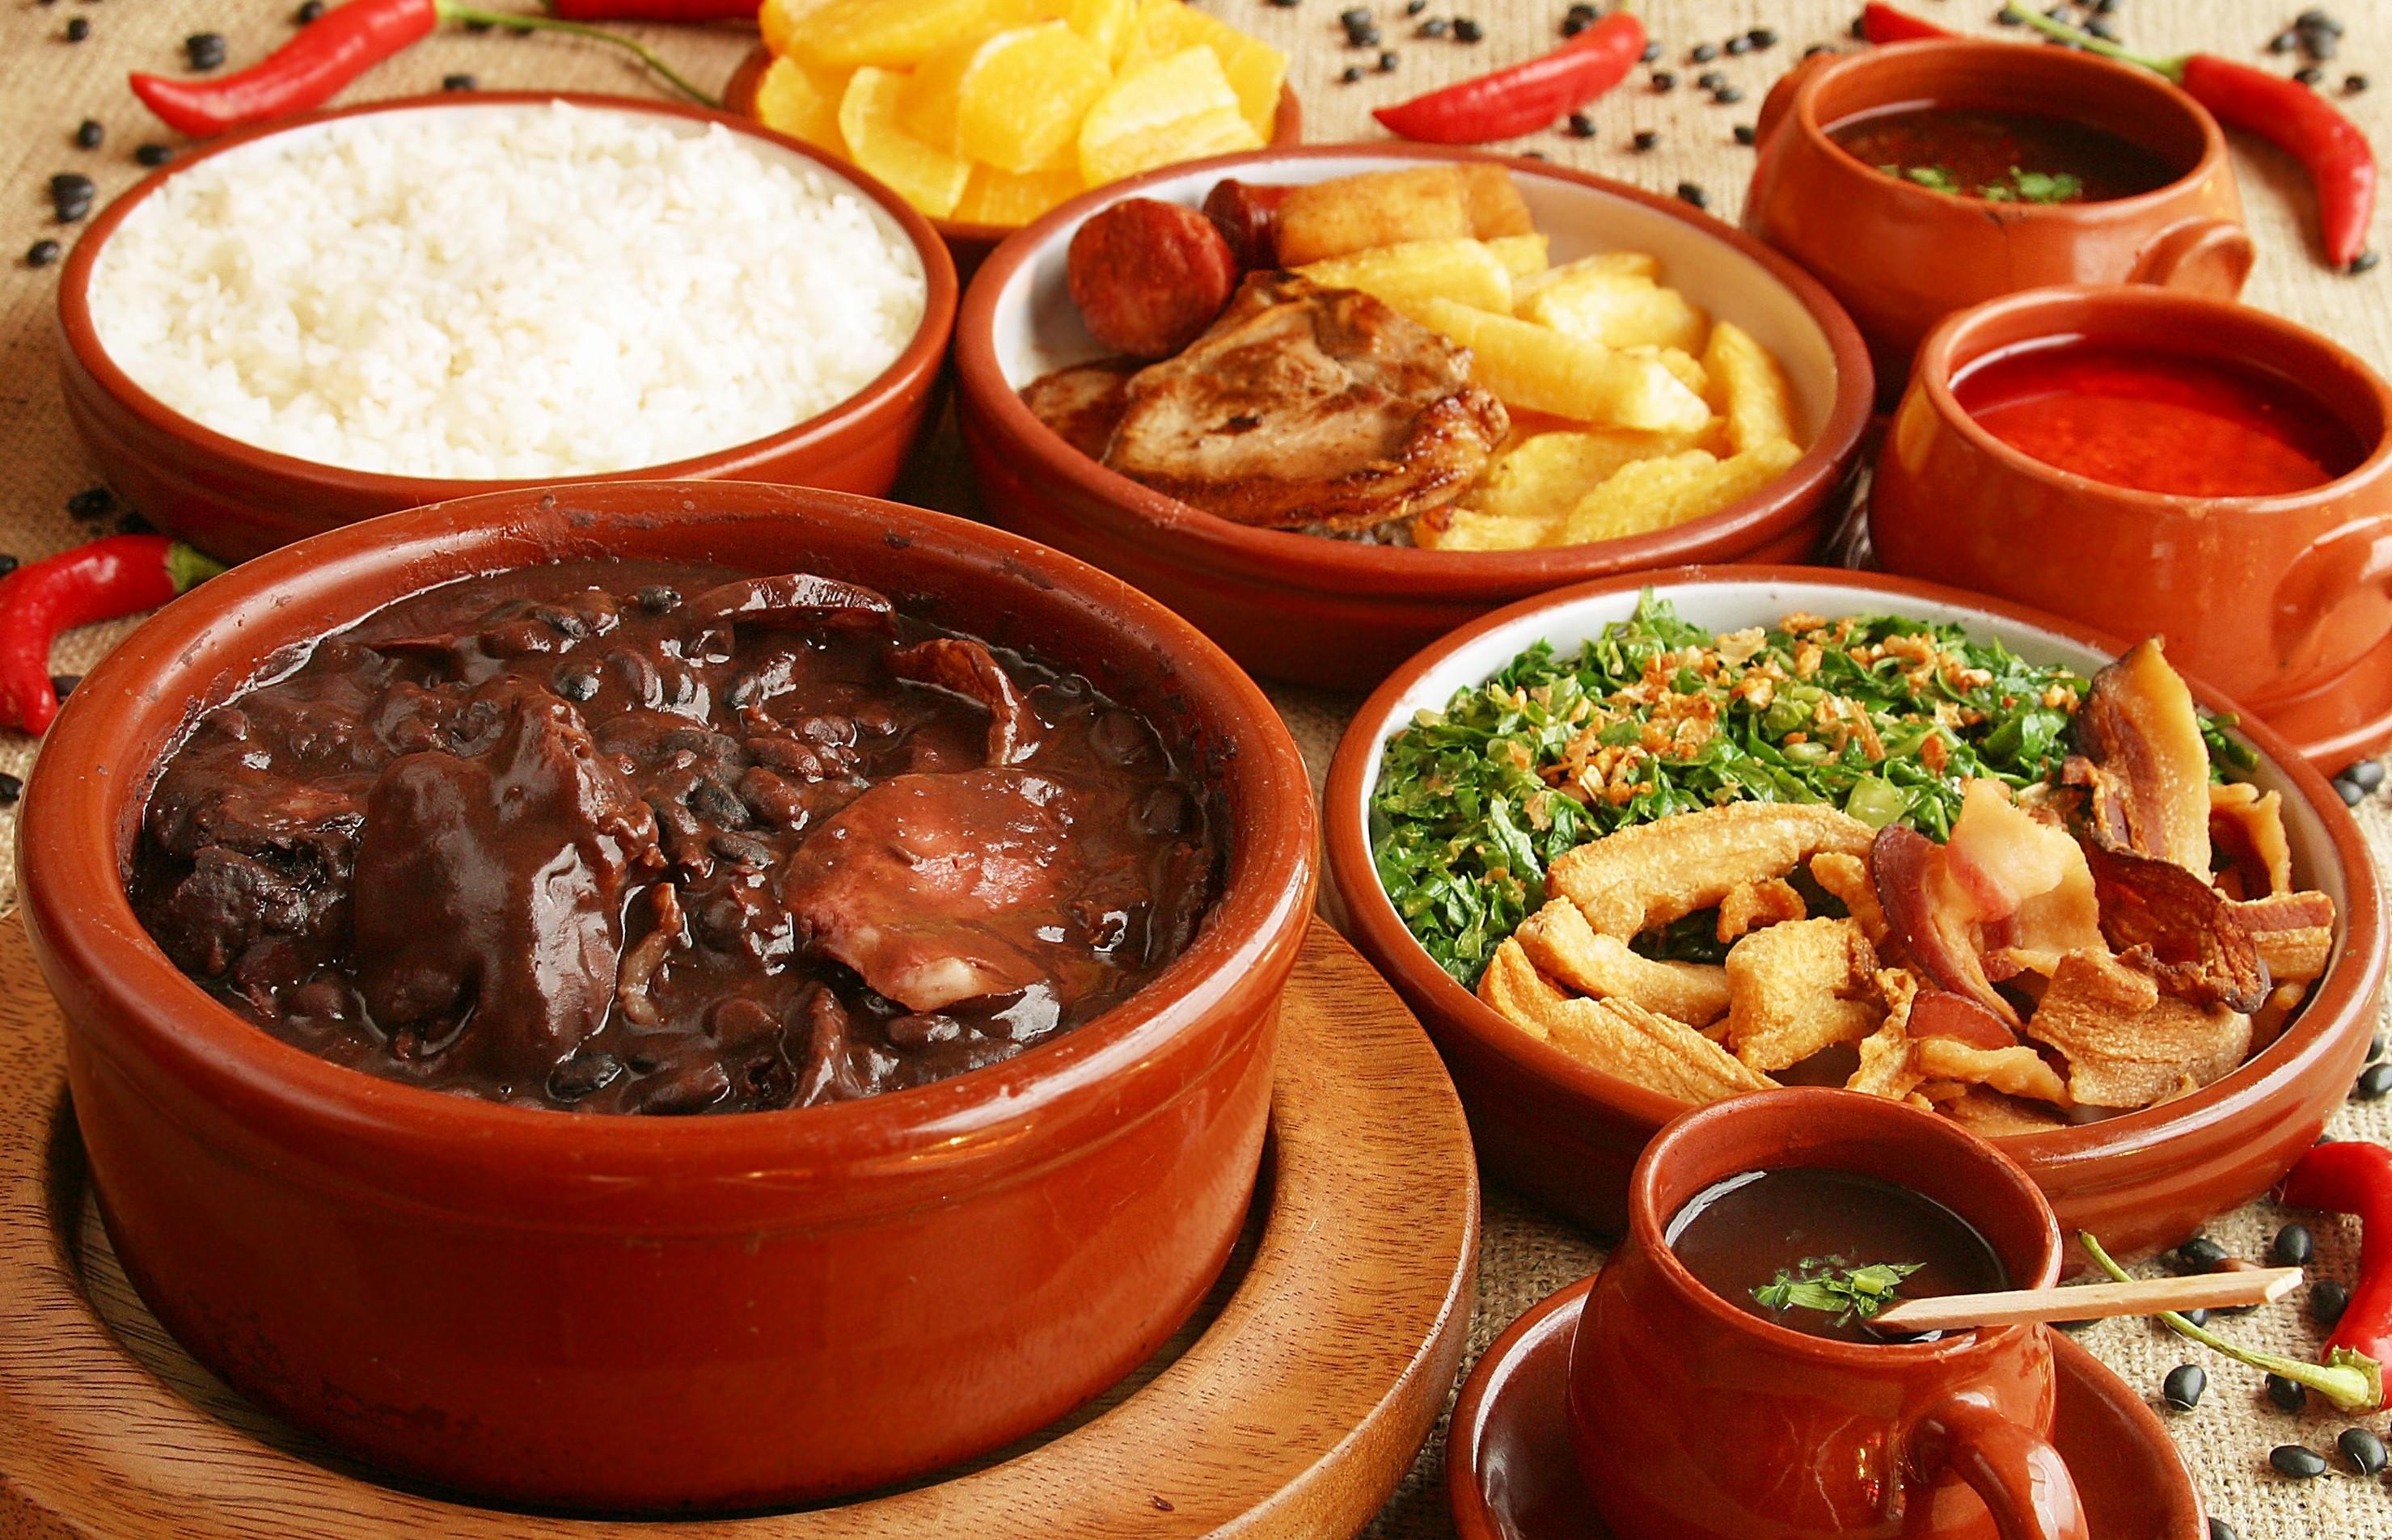 Gastronomia brasileira - Feijoada falando de turismo